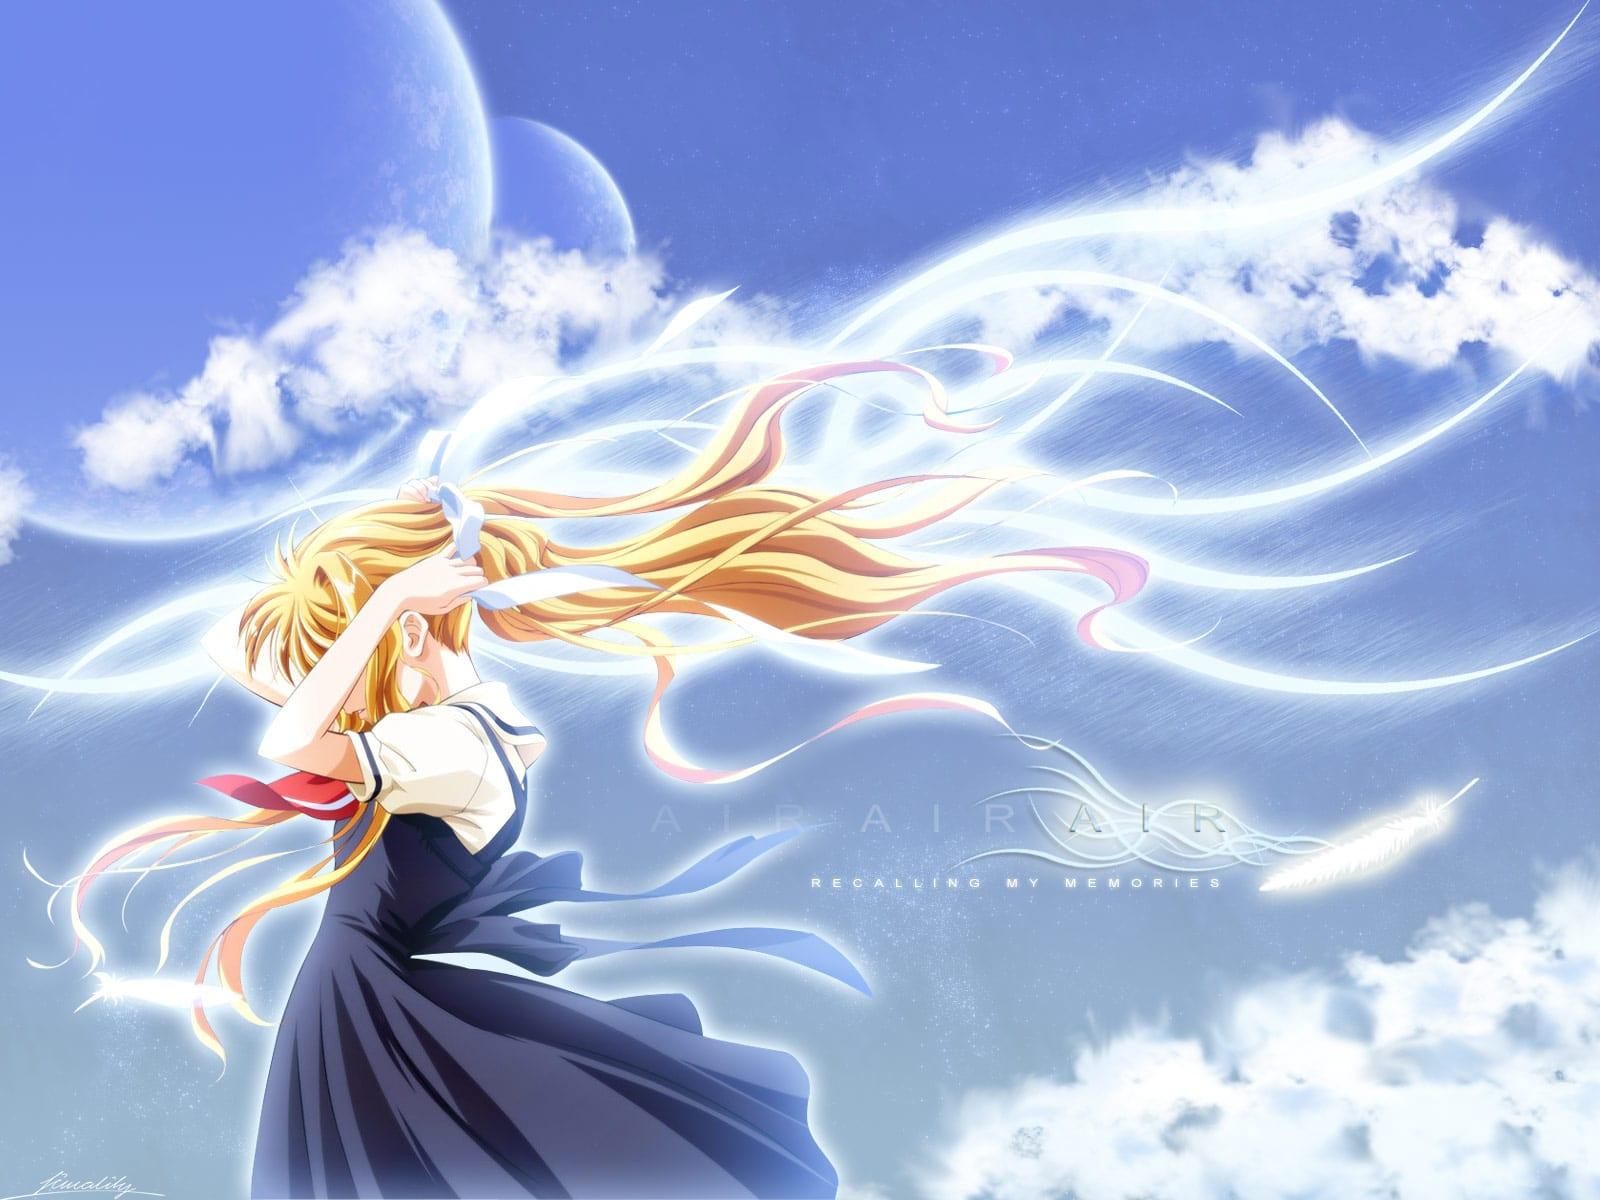 Air - Dessiner le vent ...